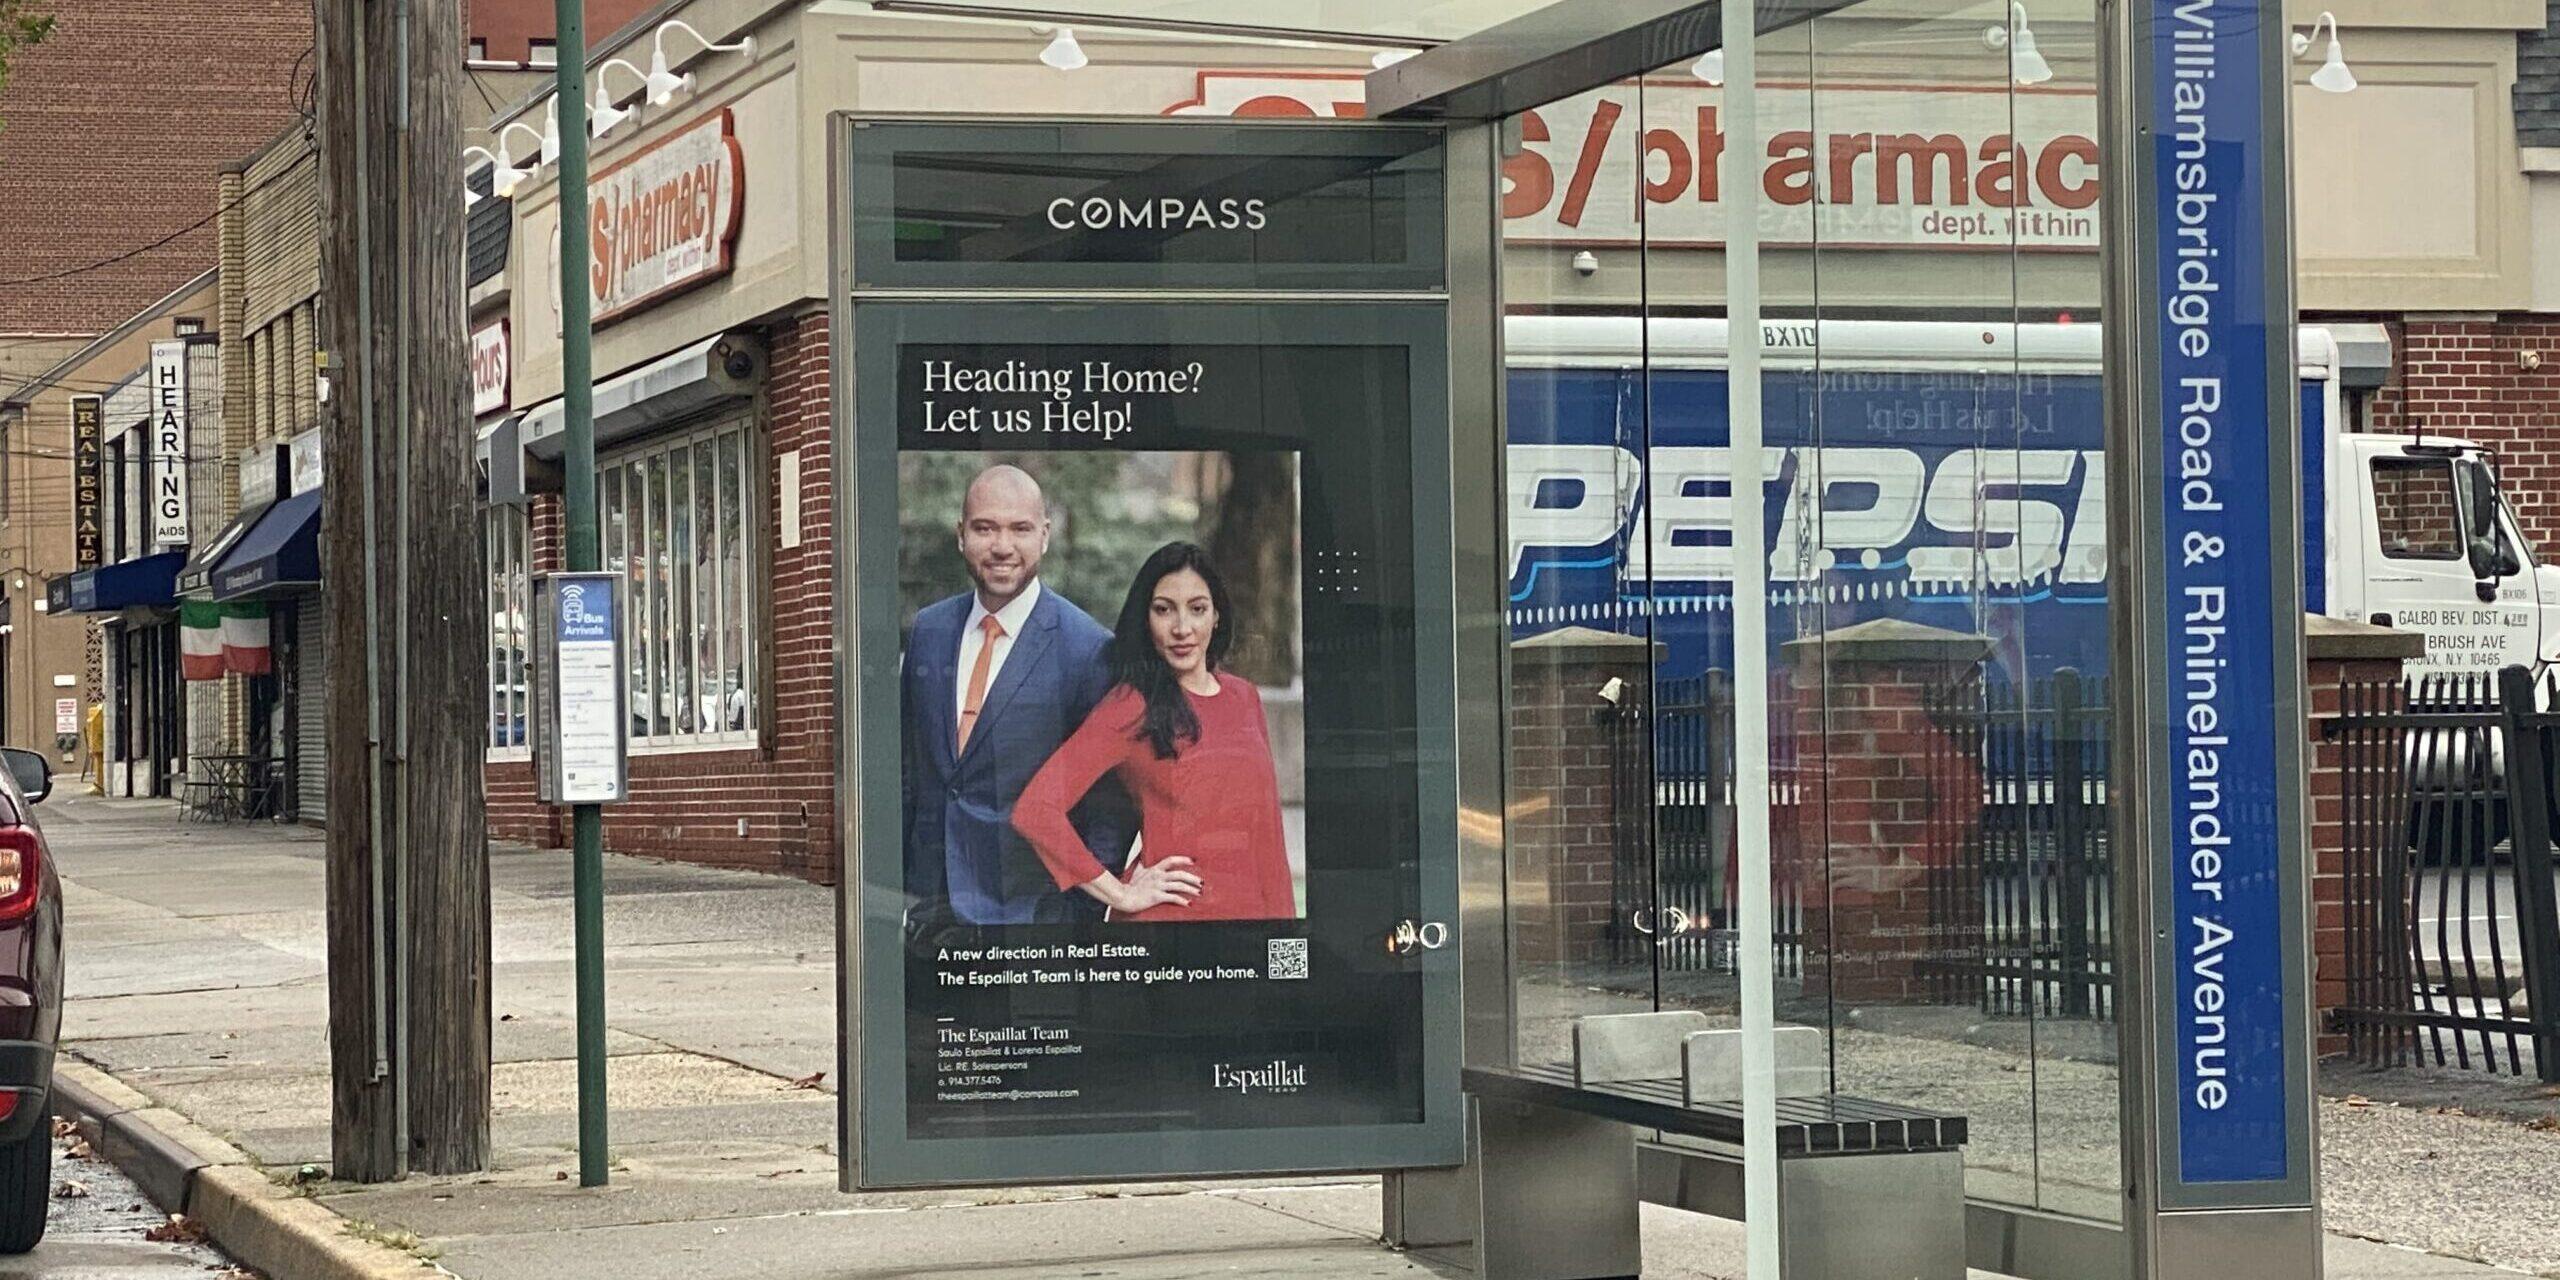 Compass Espaillat Team Bus Shelter Advertising